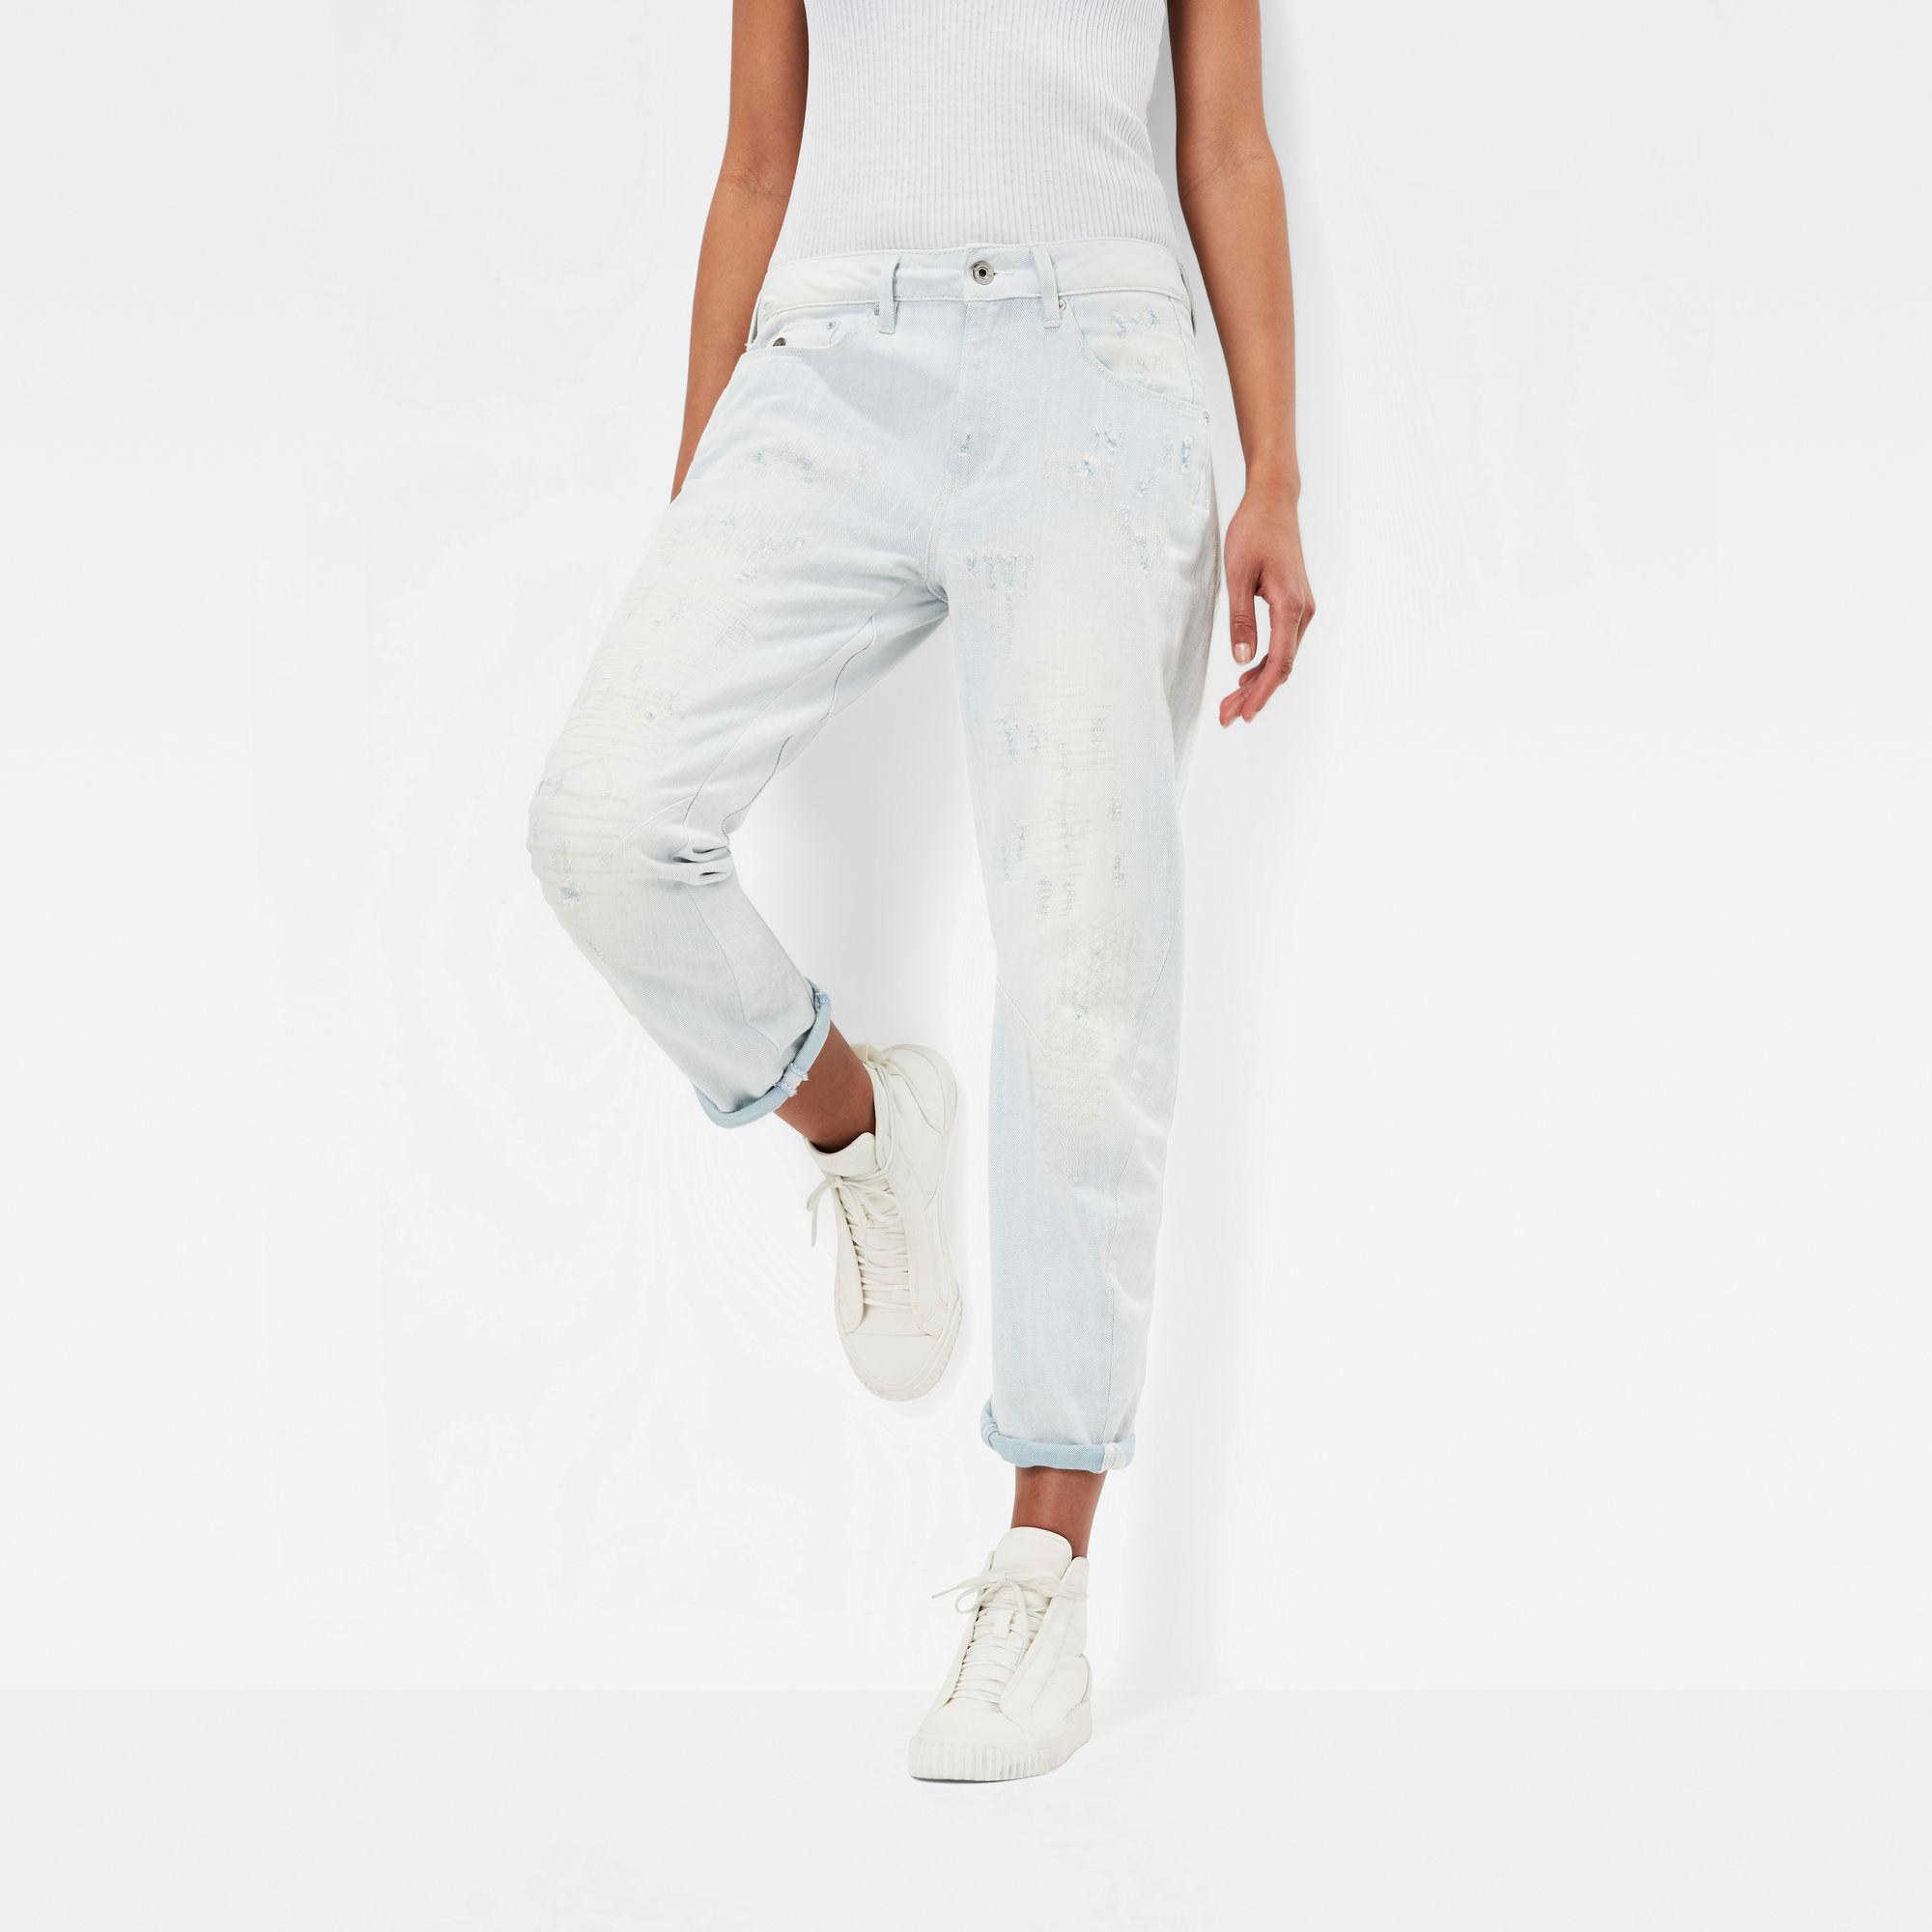 Arc 3D Mid Waist Boyfriend 7 8 Jeans